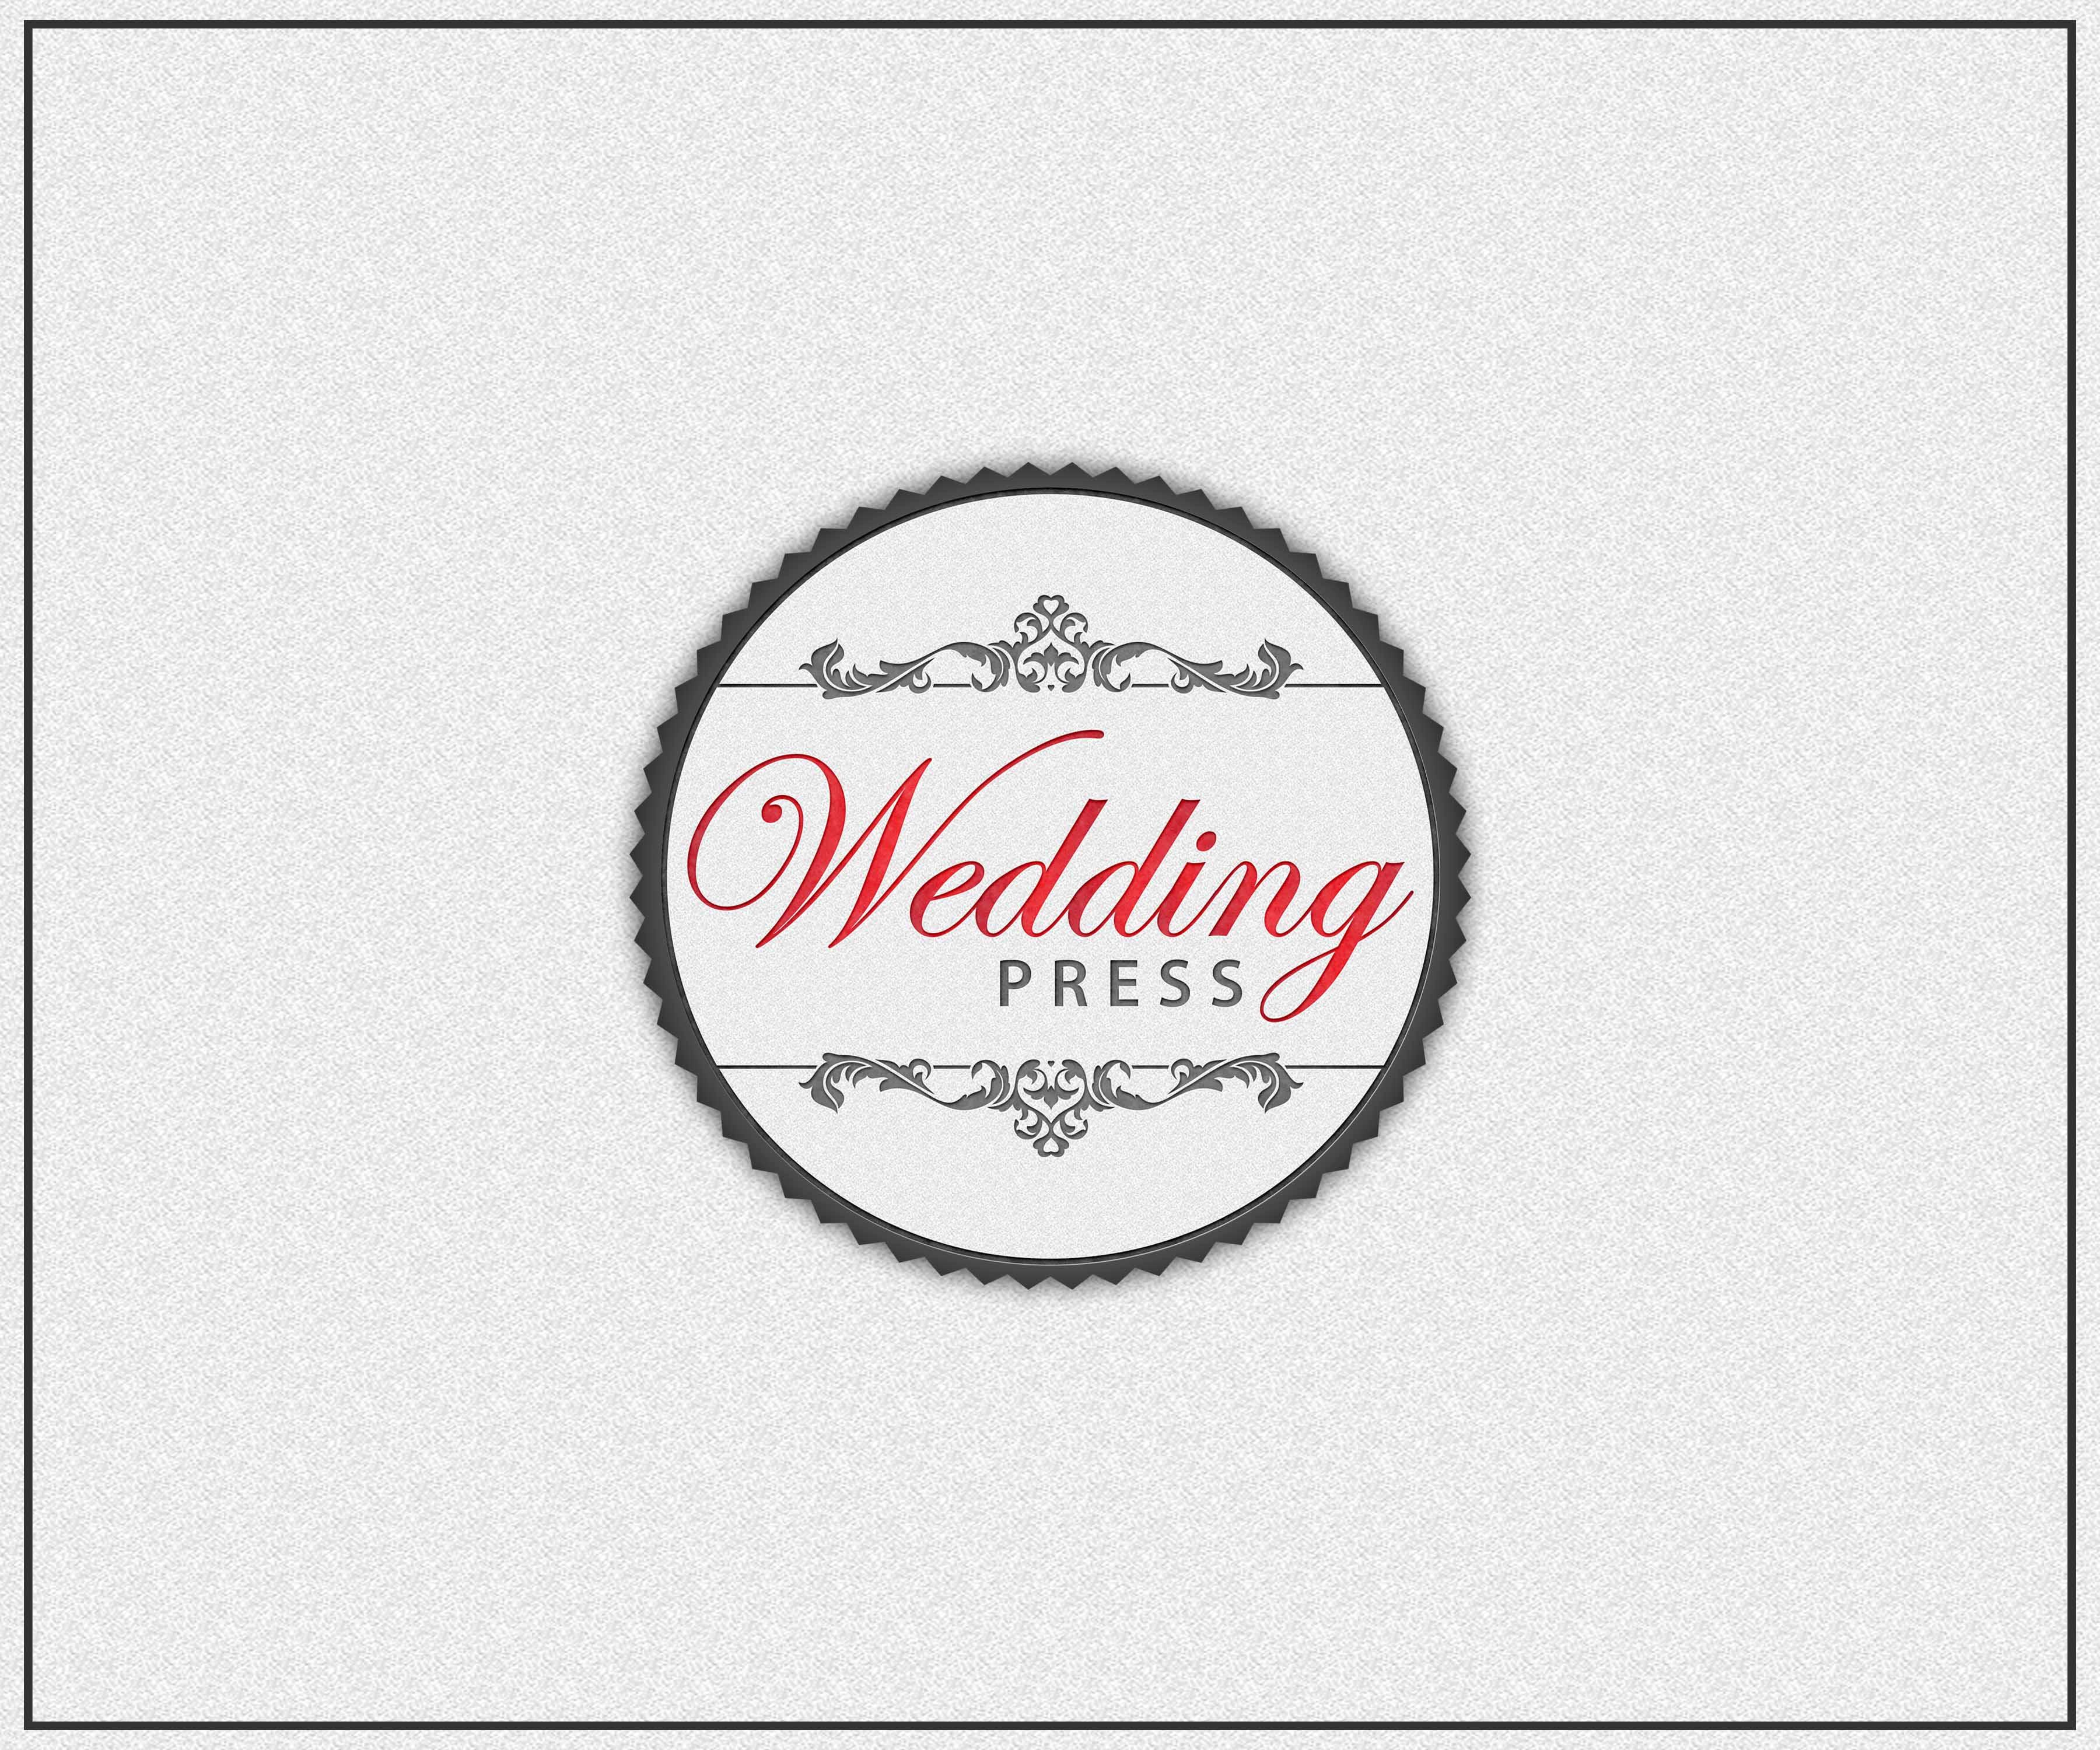 Logo Design by Hafeez Shamsuddin - Entry No. 156 in the Logo Design Contest Wedding Writes Logo Design.